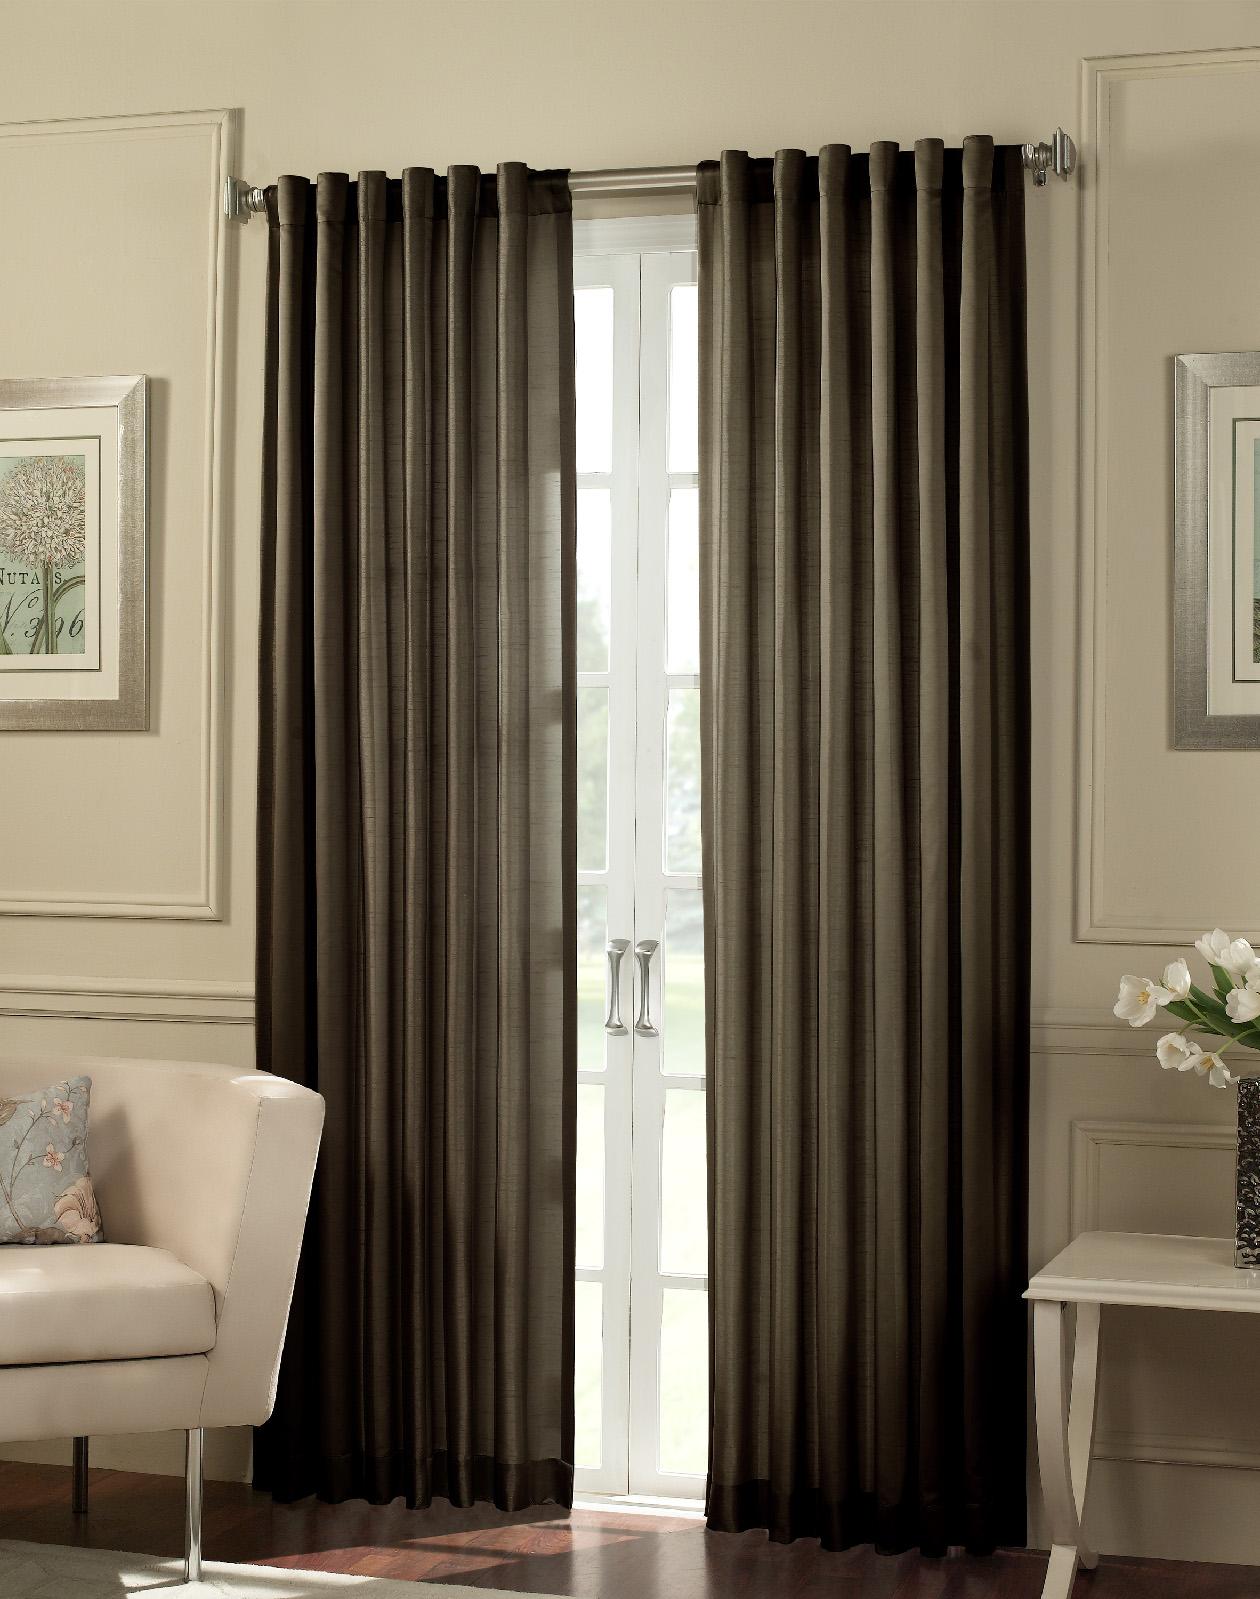 classic frame panels for windows custom home design window curtain panel image 10 of 10